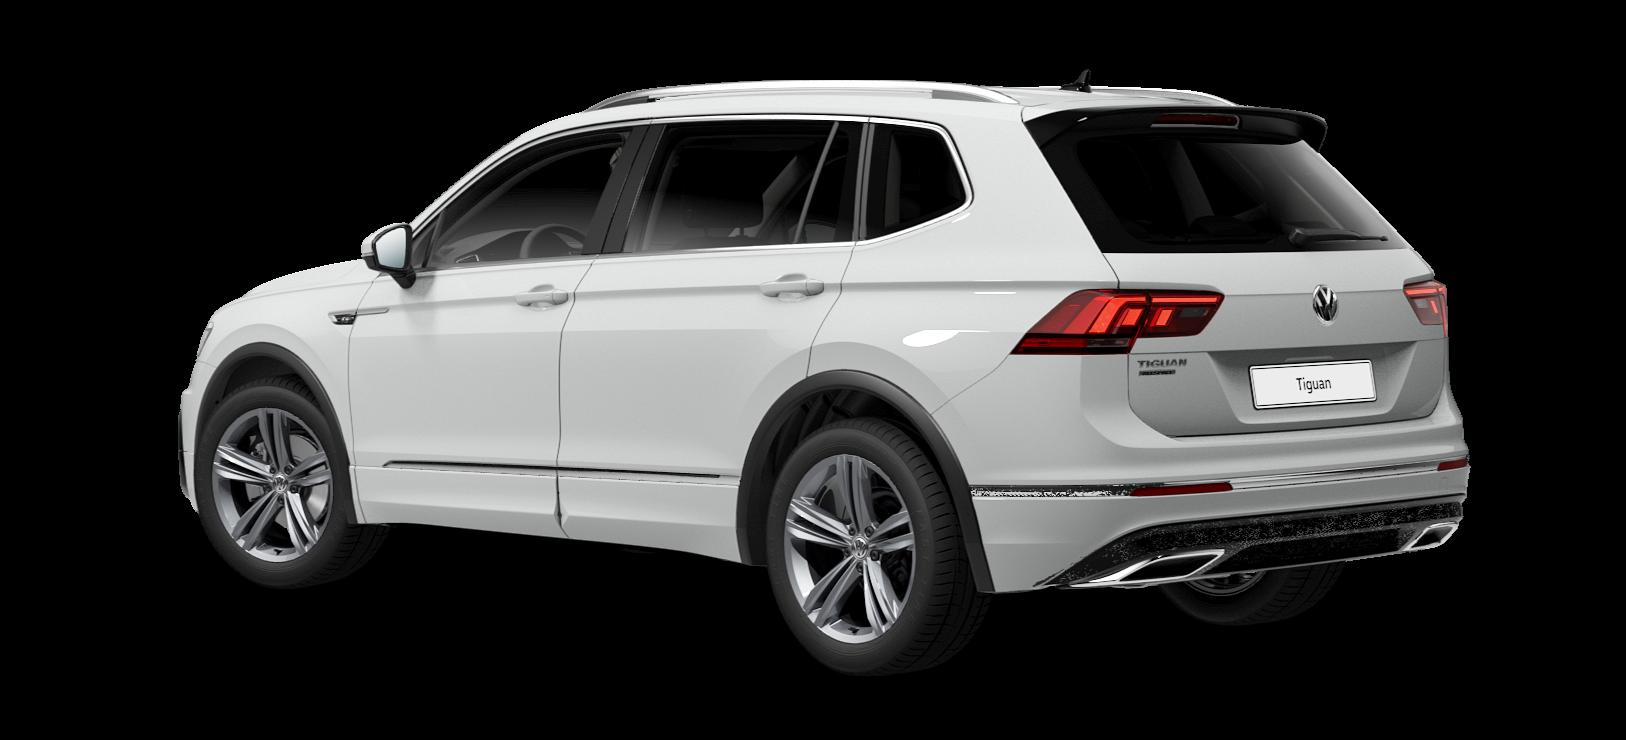 Volkswagen Tiguan Allspace Advance 2.0 TDI 110 kW (150 CV)